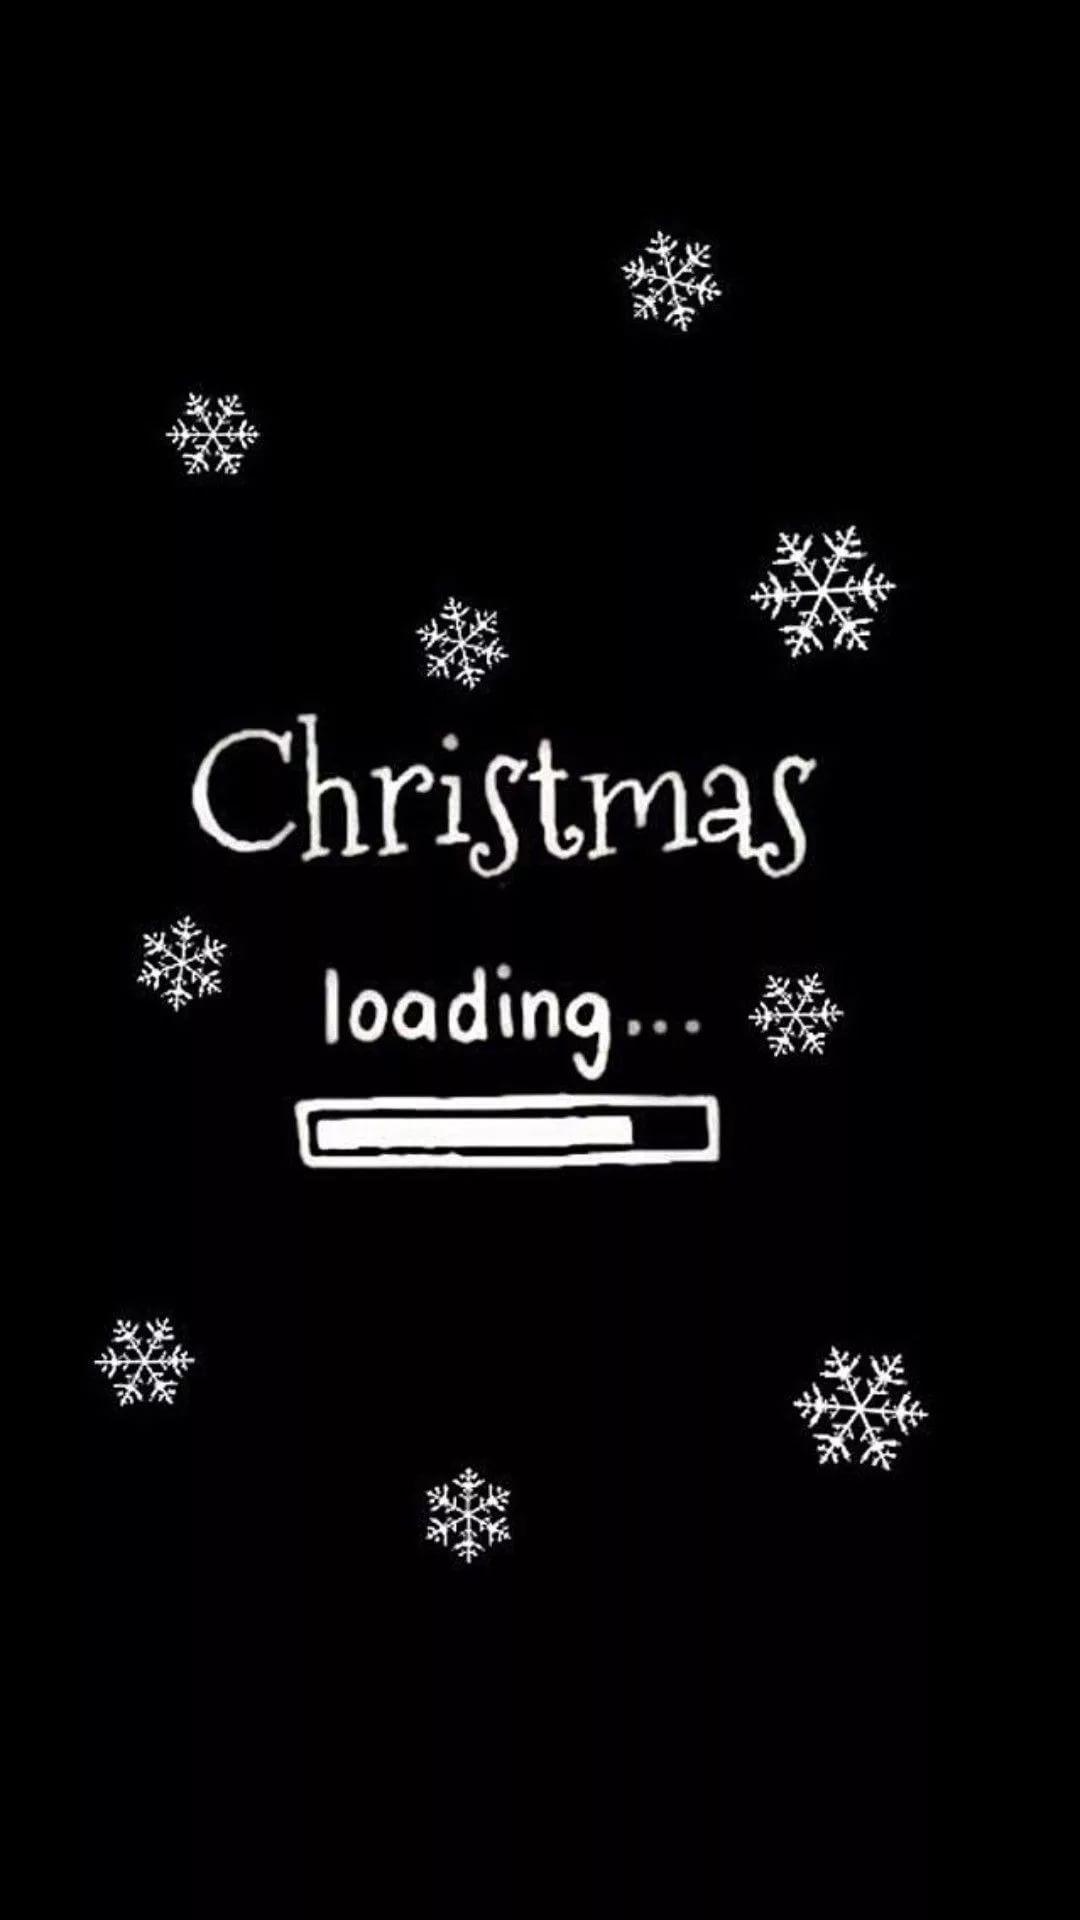 Free Christmas phone background